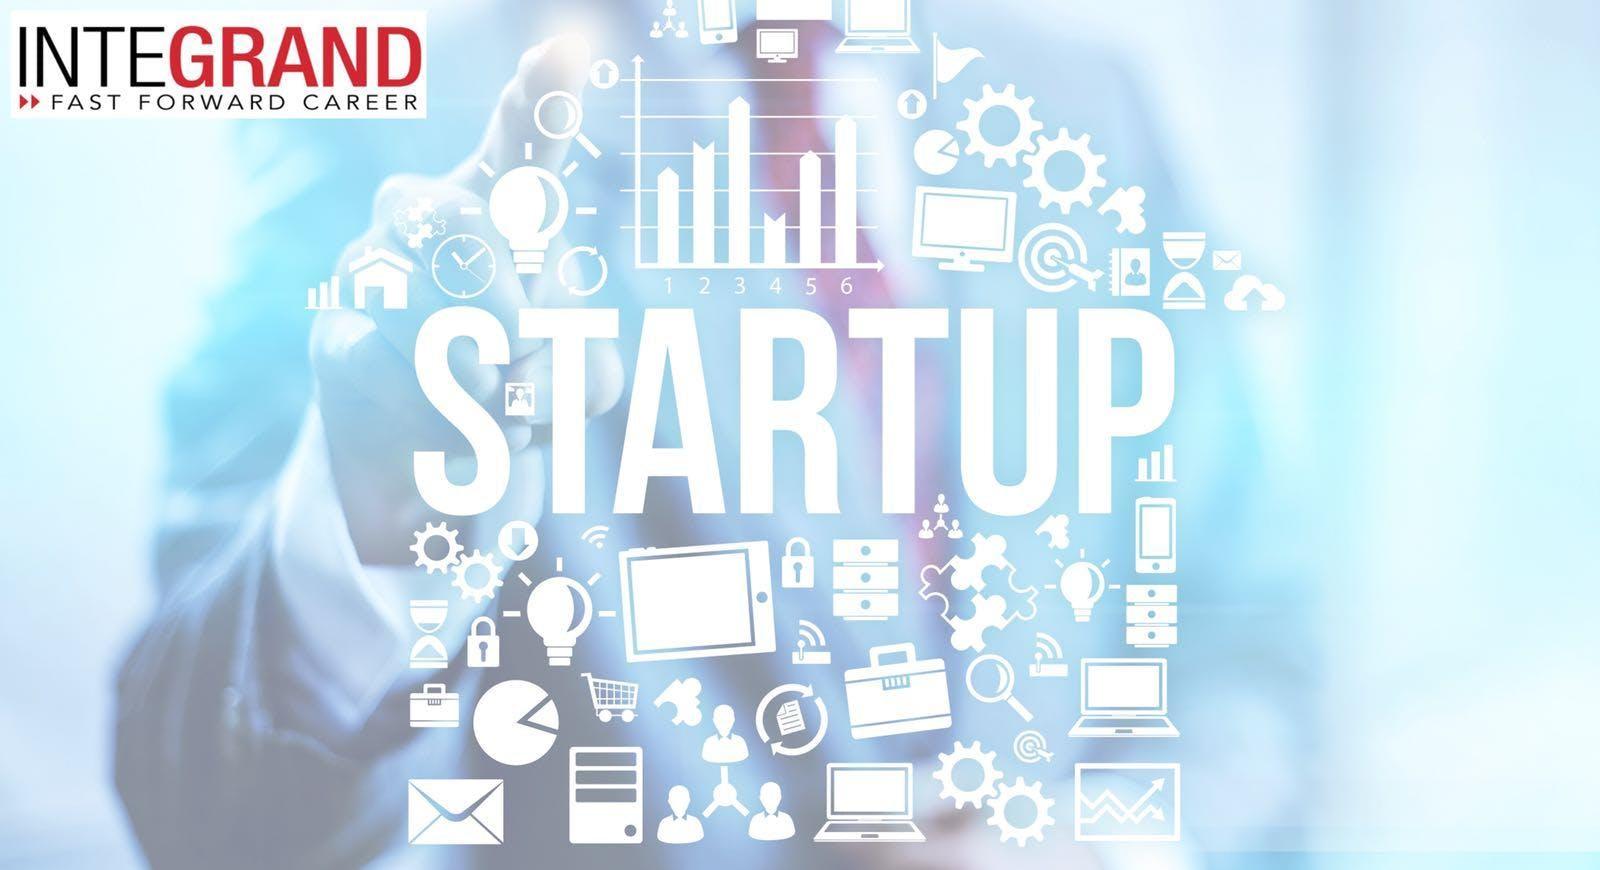 Integrand Start-up Tour 2018 - powered by Jul